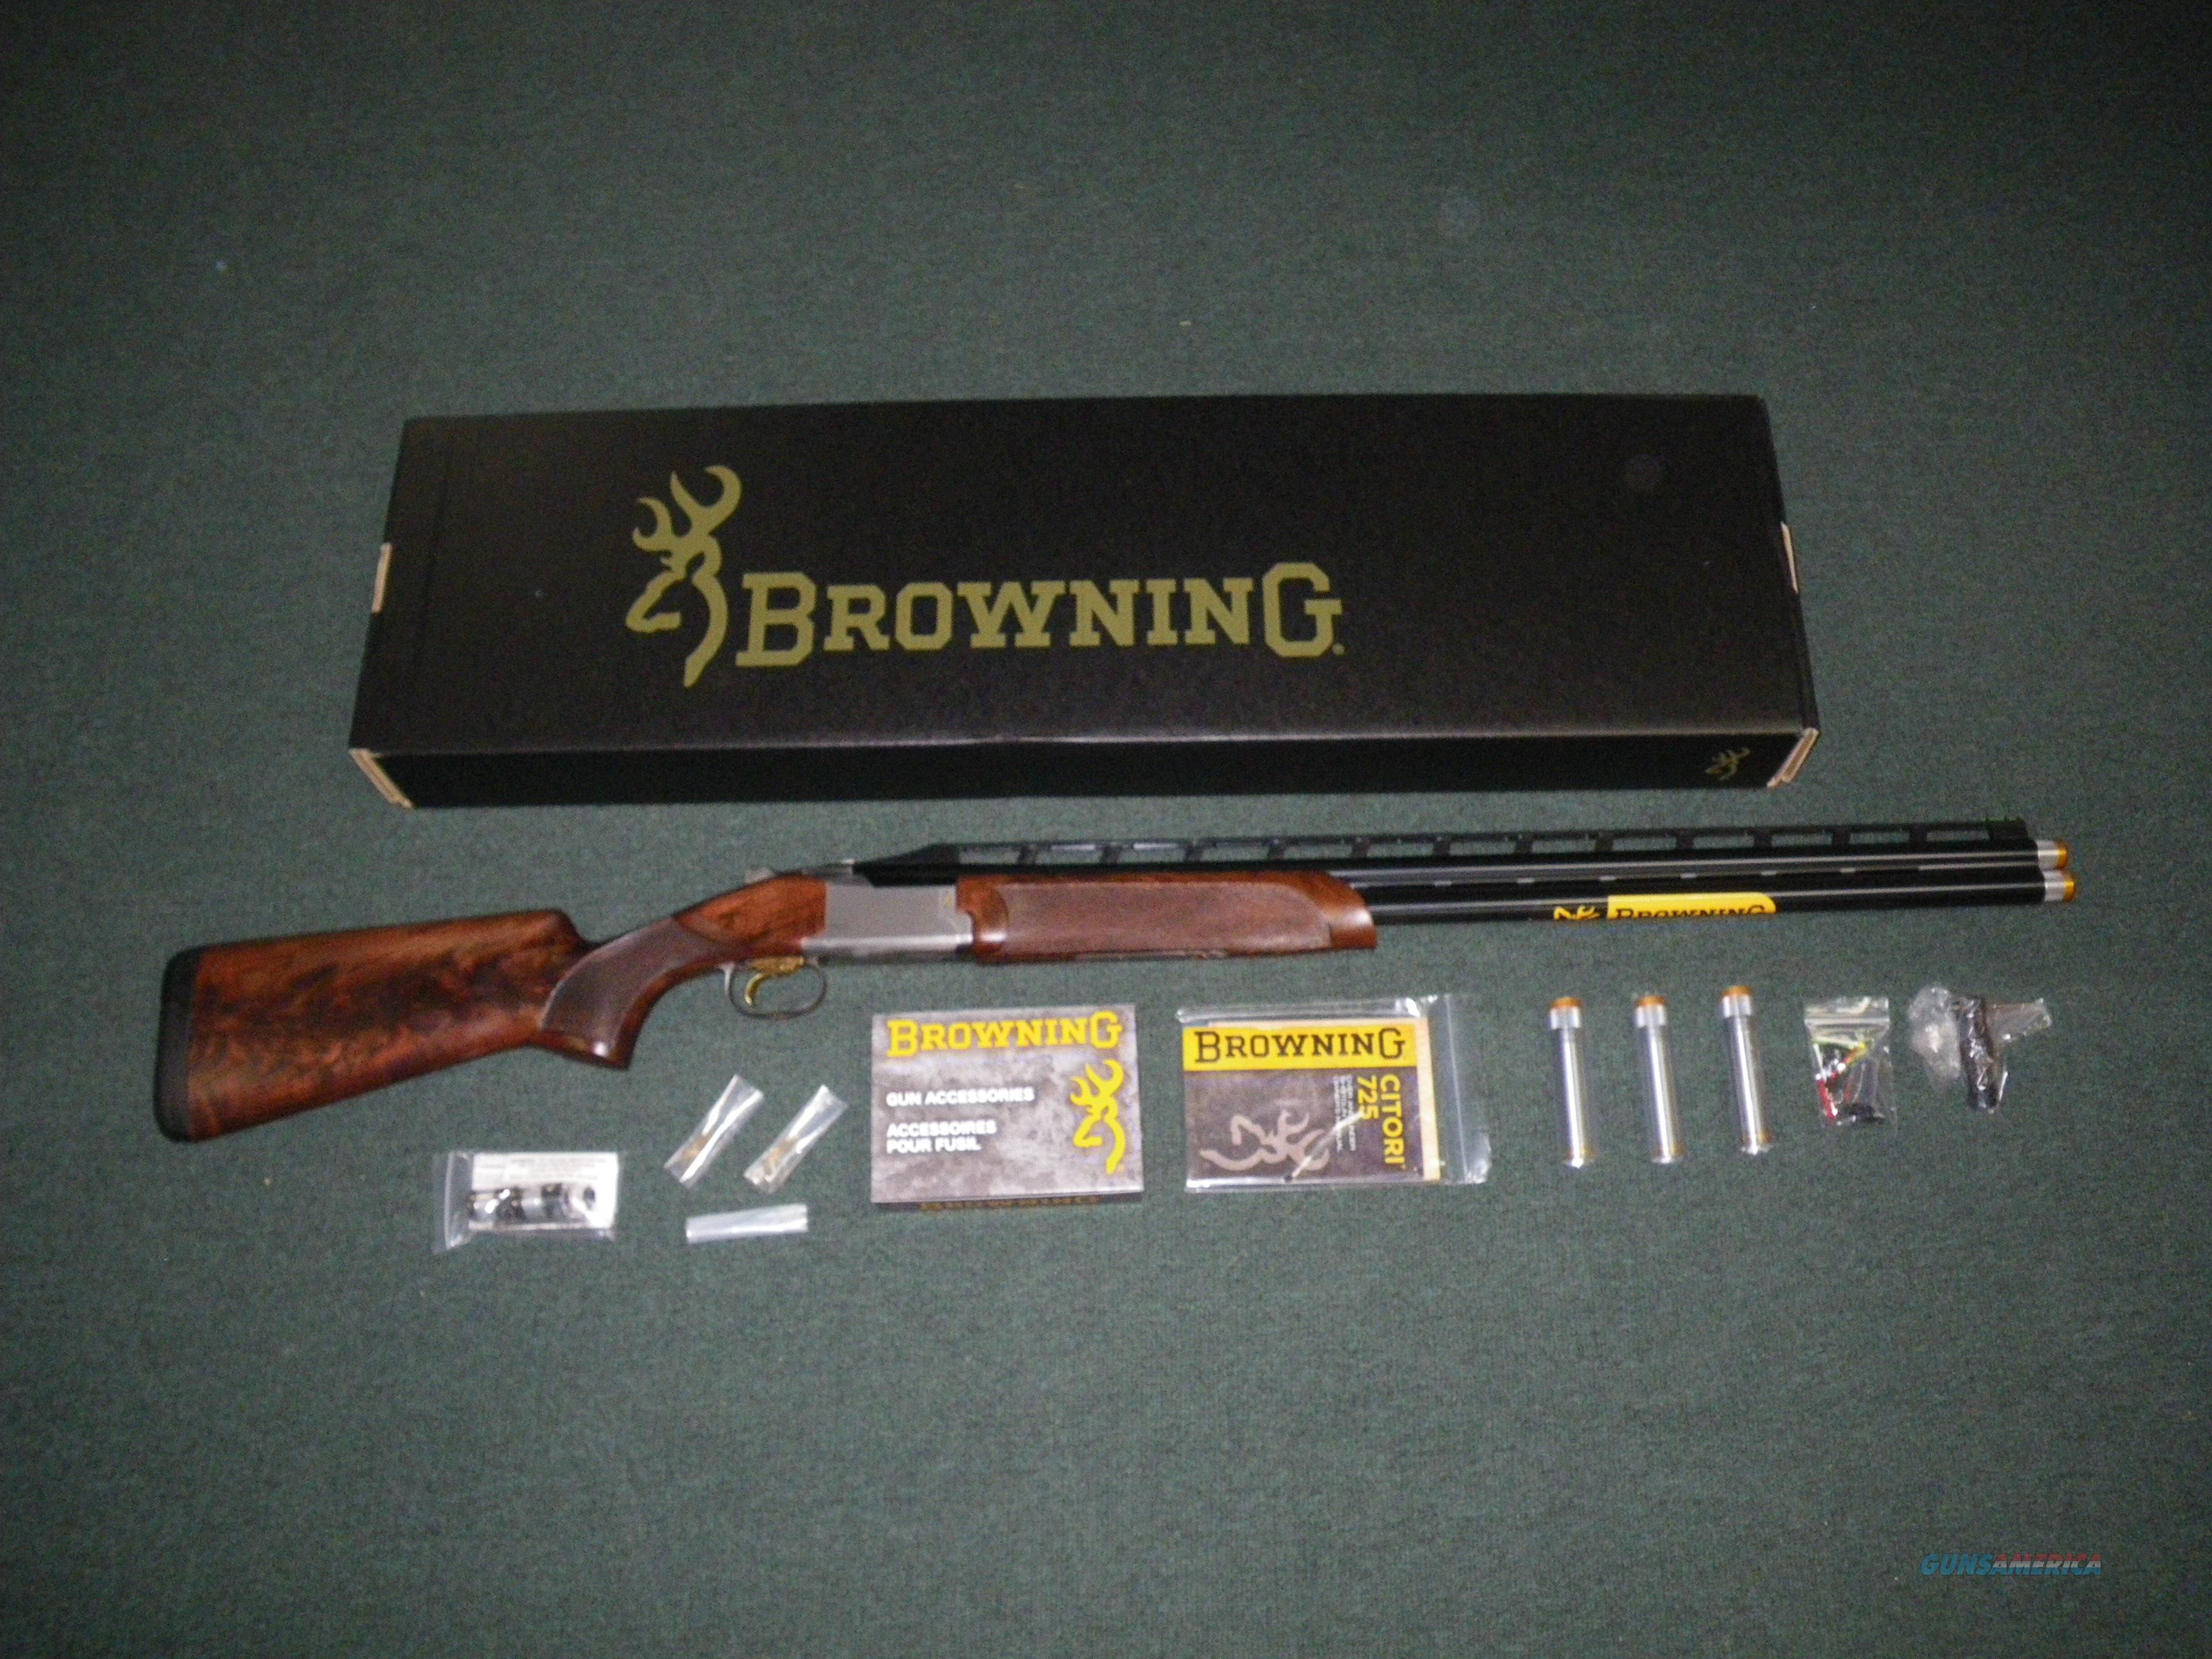 "Browning Citori 725 High Rib Sporting 12ga 30"" NEW #0180553010  Guns > Shotguns > Browning Shotguns > Over Unders > Citori > Hunting"